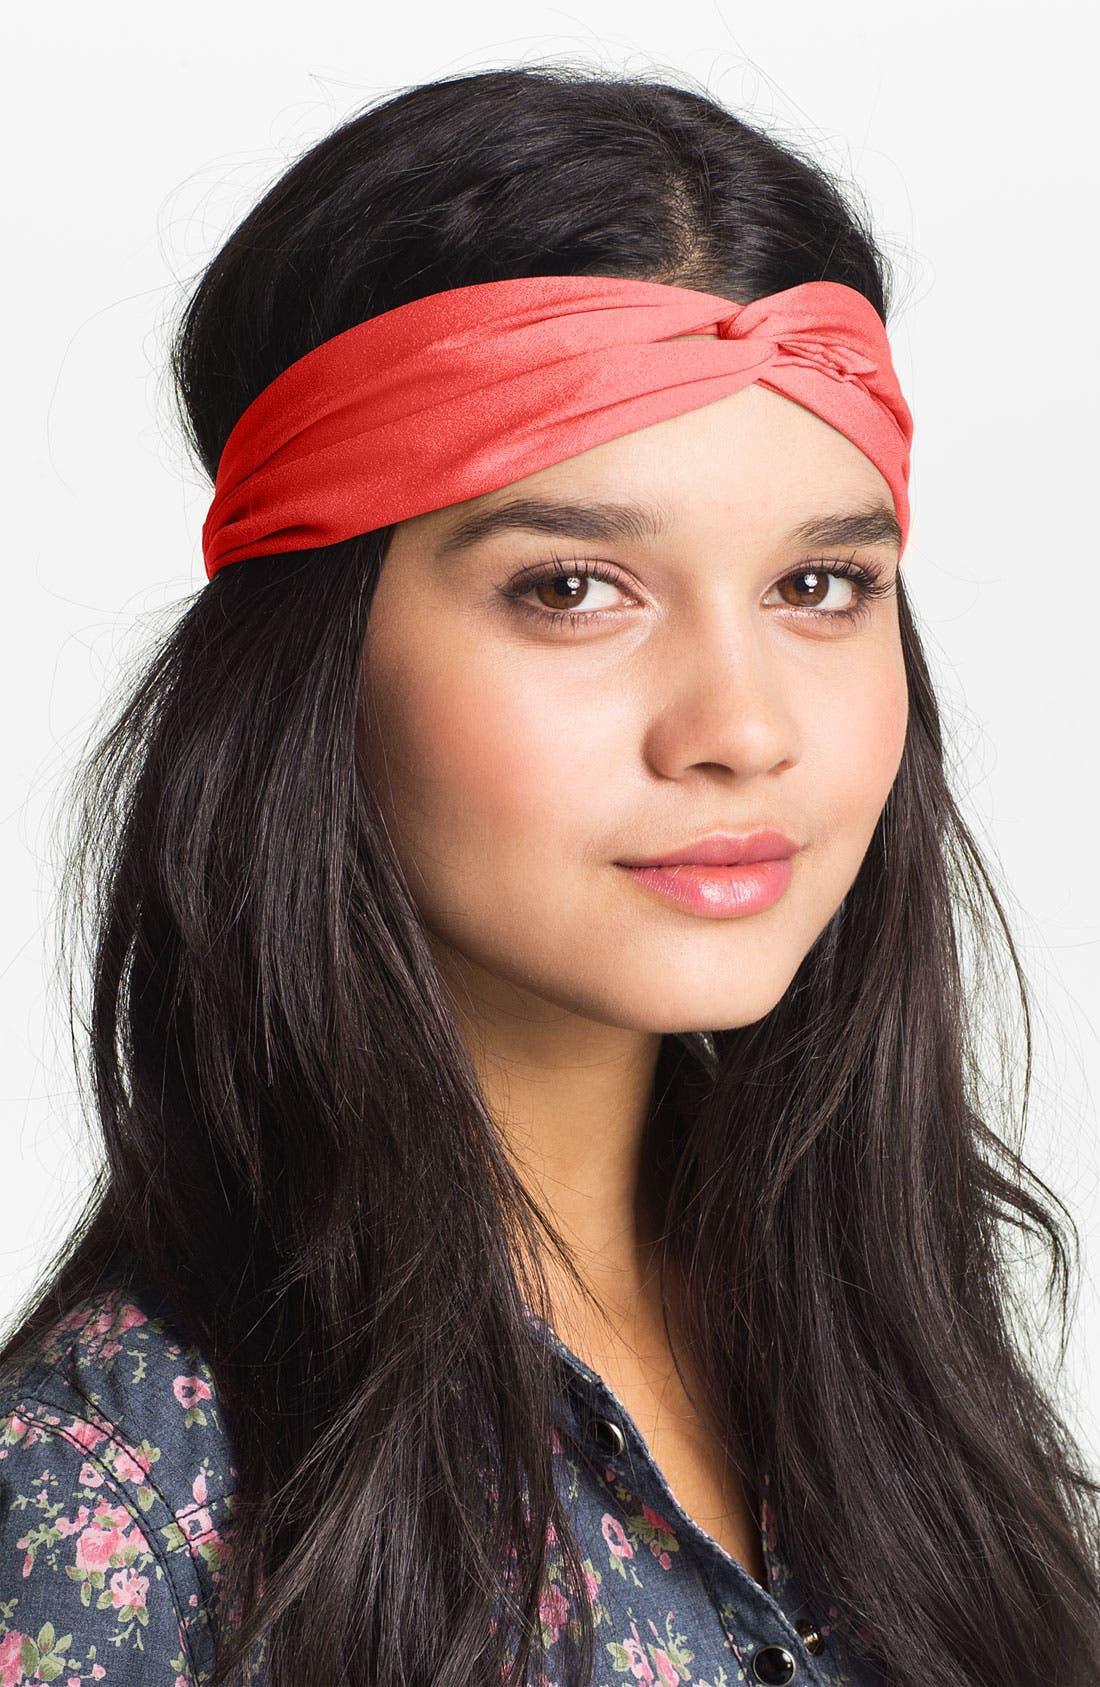 Alternate Image 1 Selected - Carole Twist Knot Headband